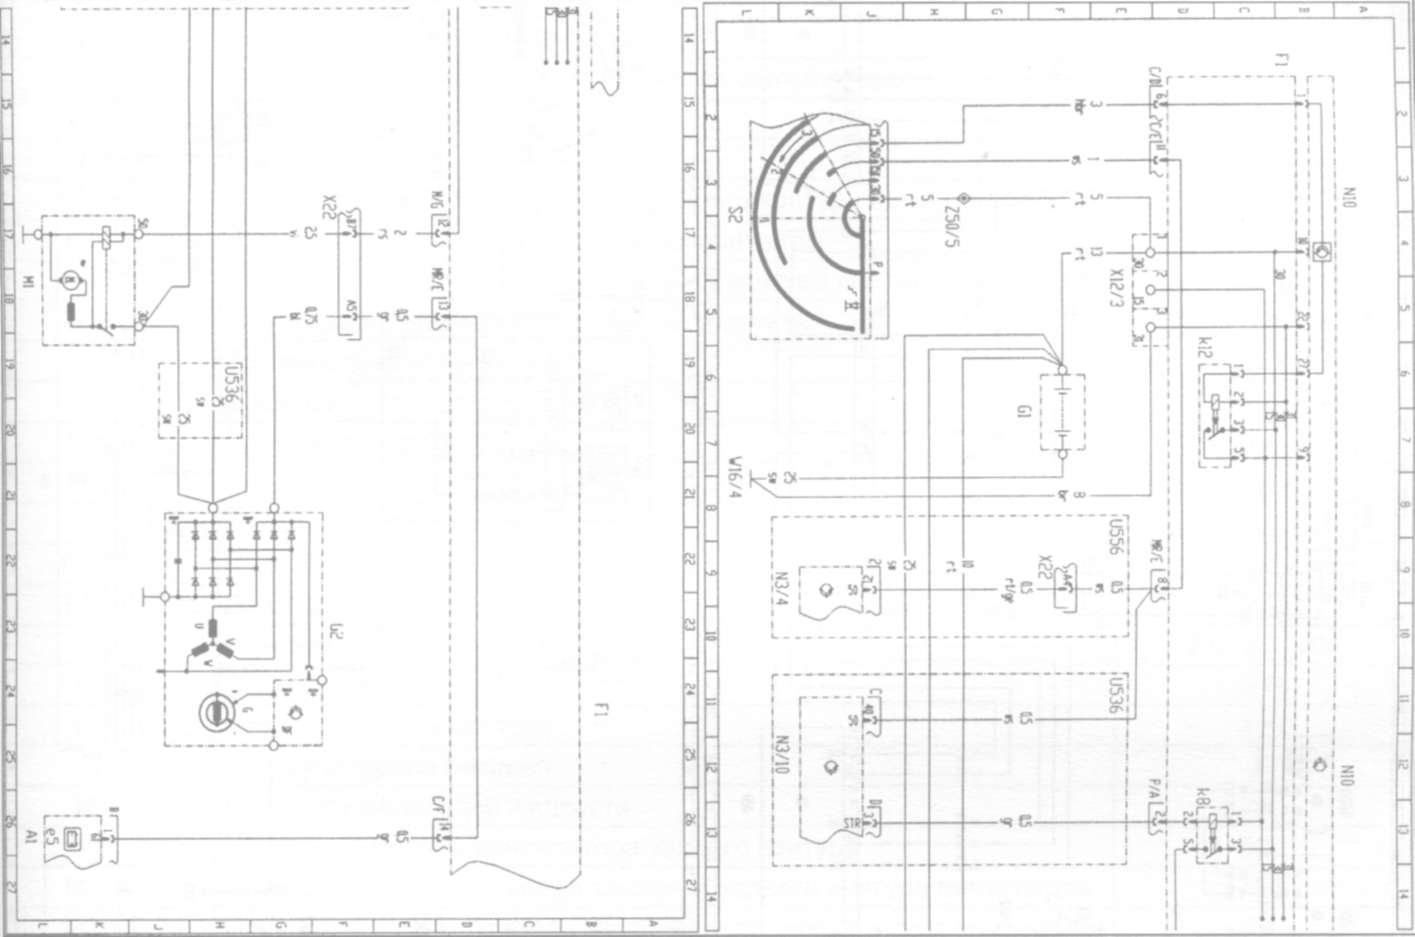 26.0 Схемы электрооборудования